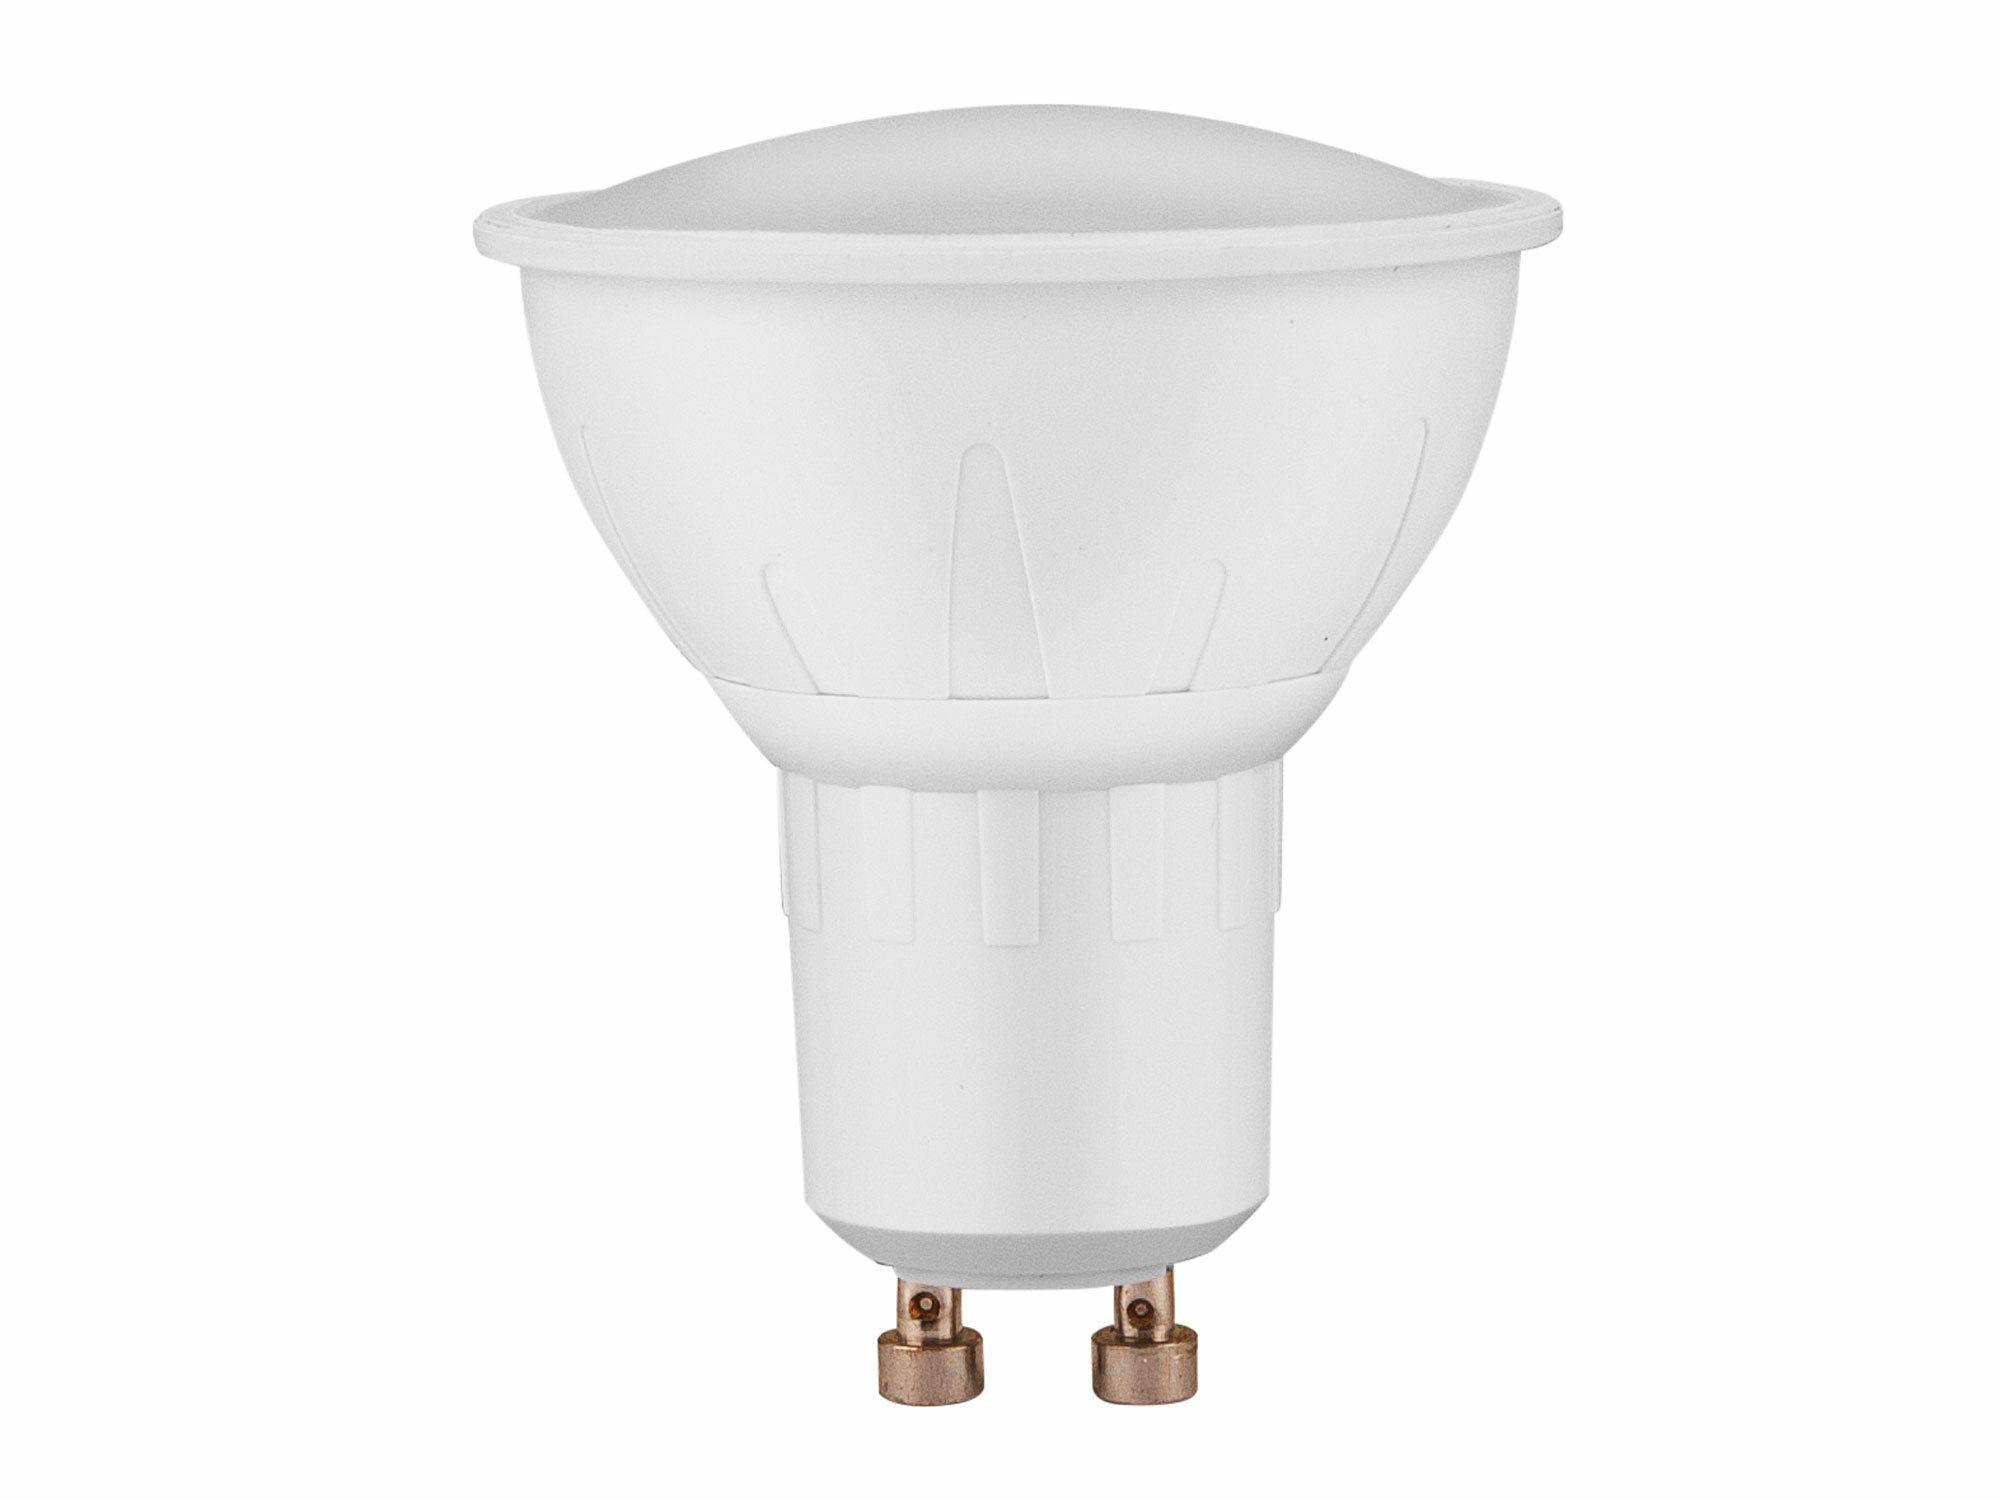 Žárovka LED reflektorová, 6W, 450lm, GU10, teplá bílá EXTOL-LIGHT